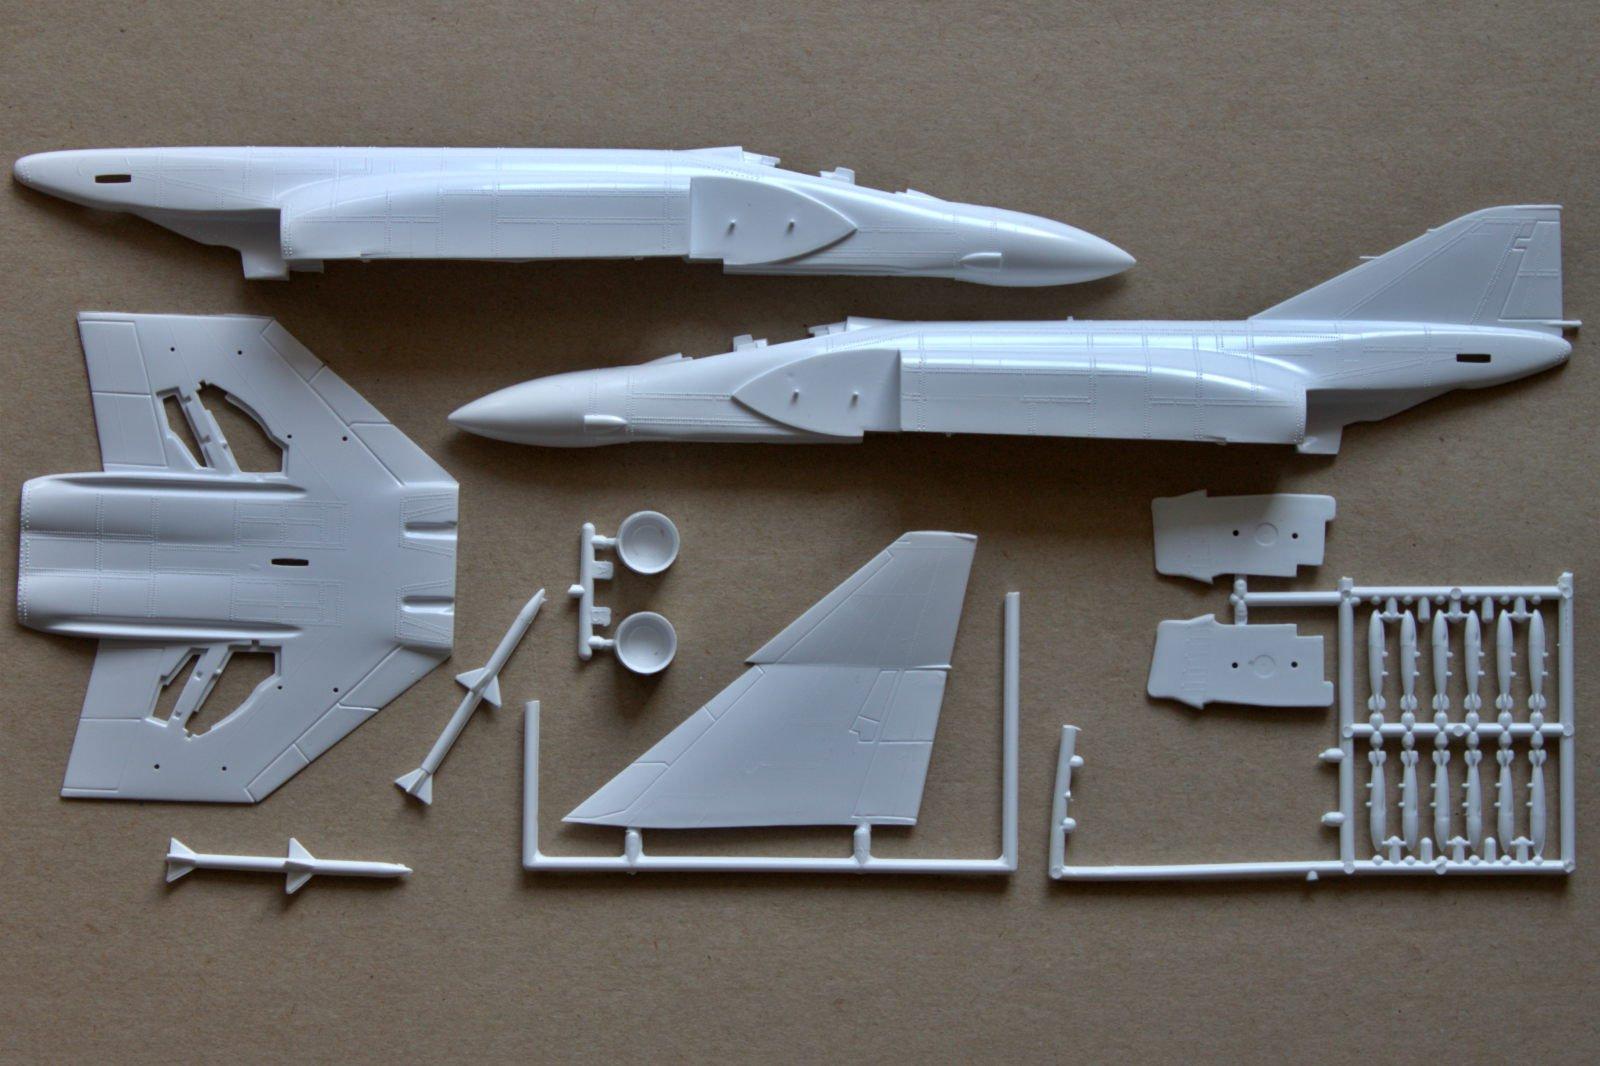 F-4 Phantom II FROG review